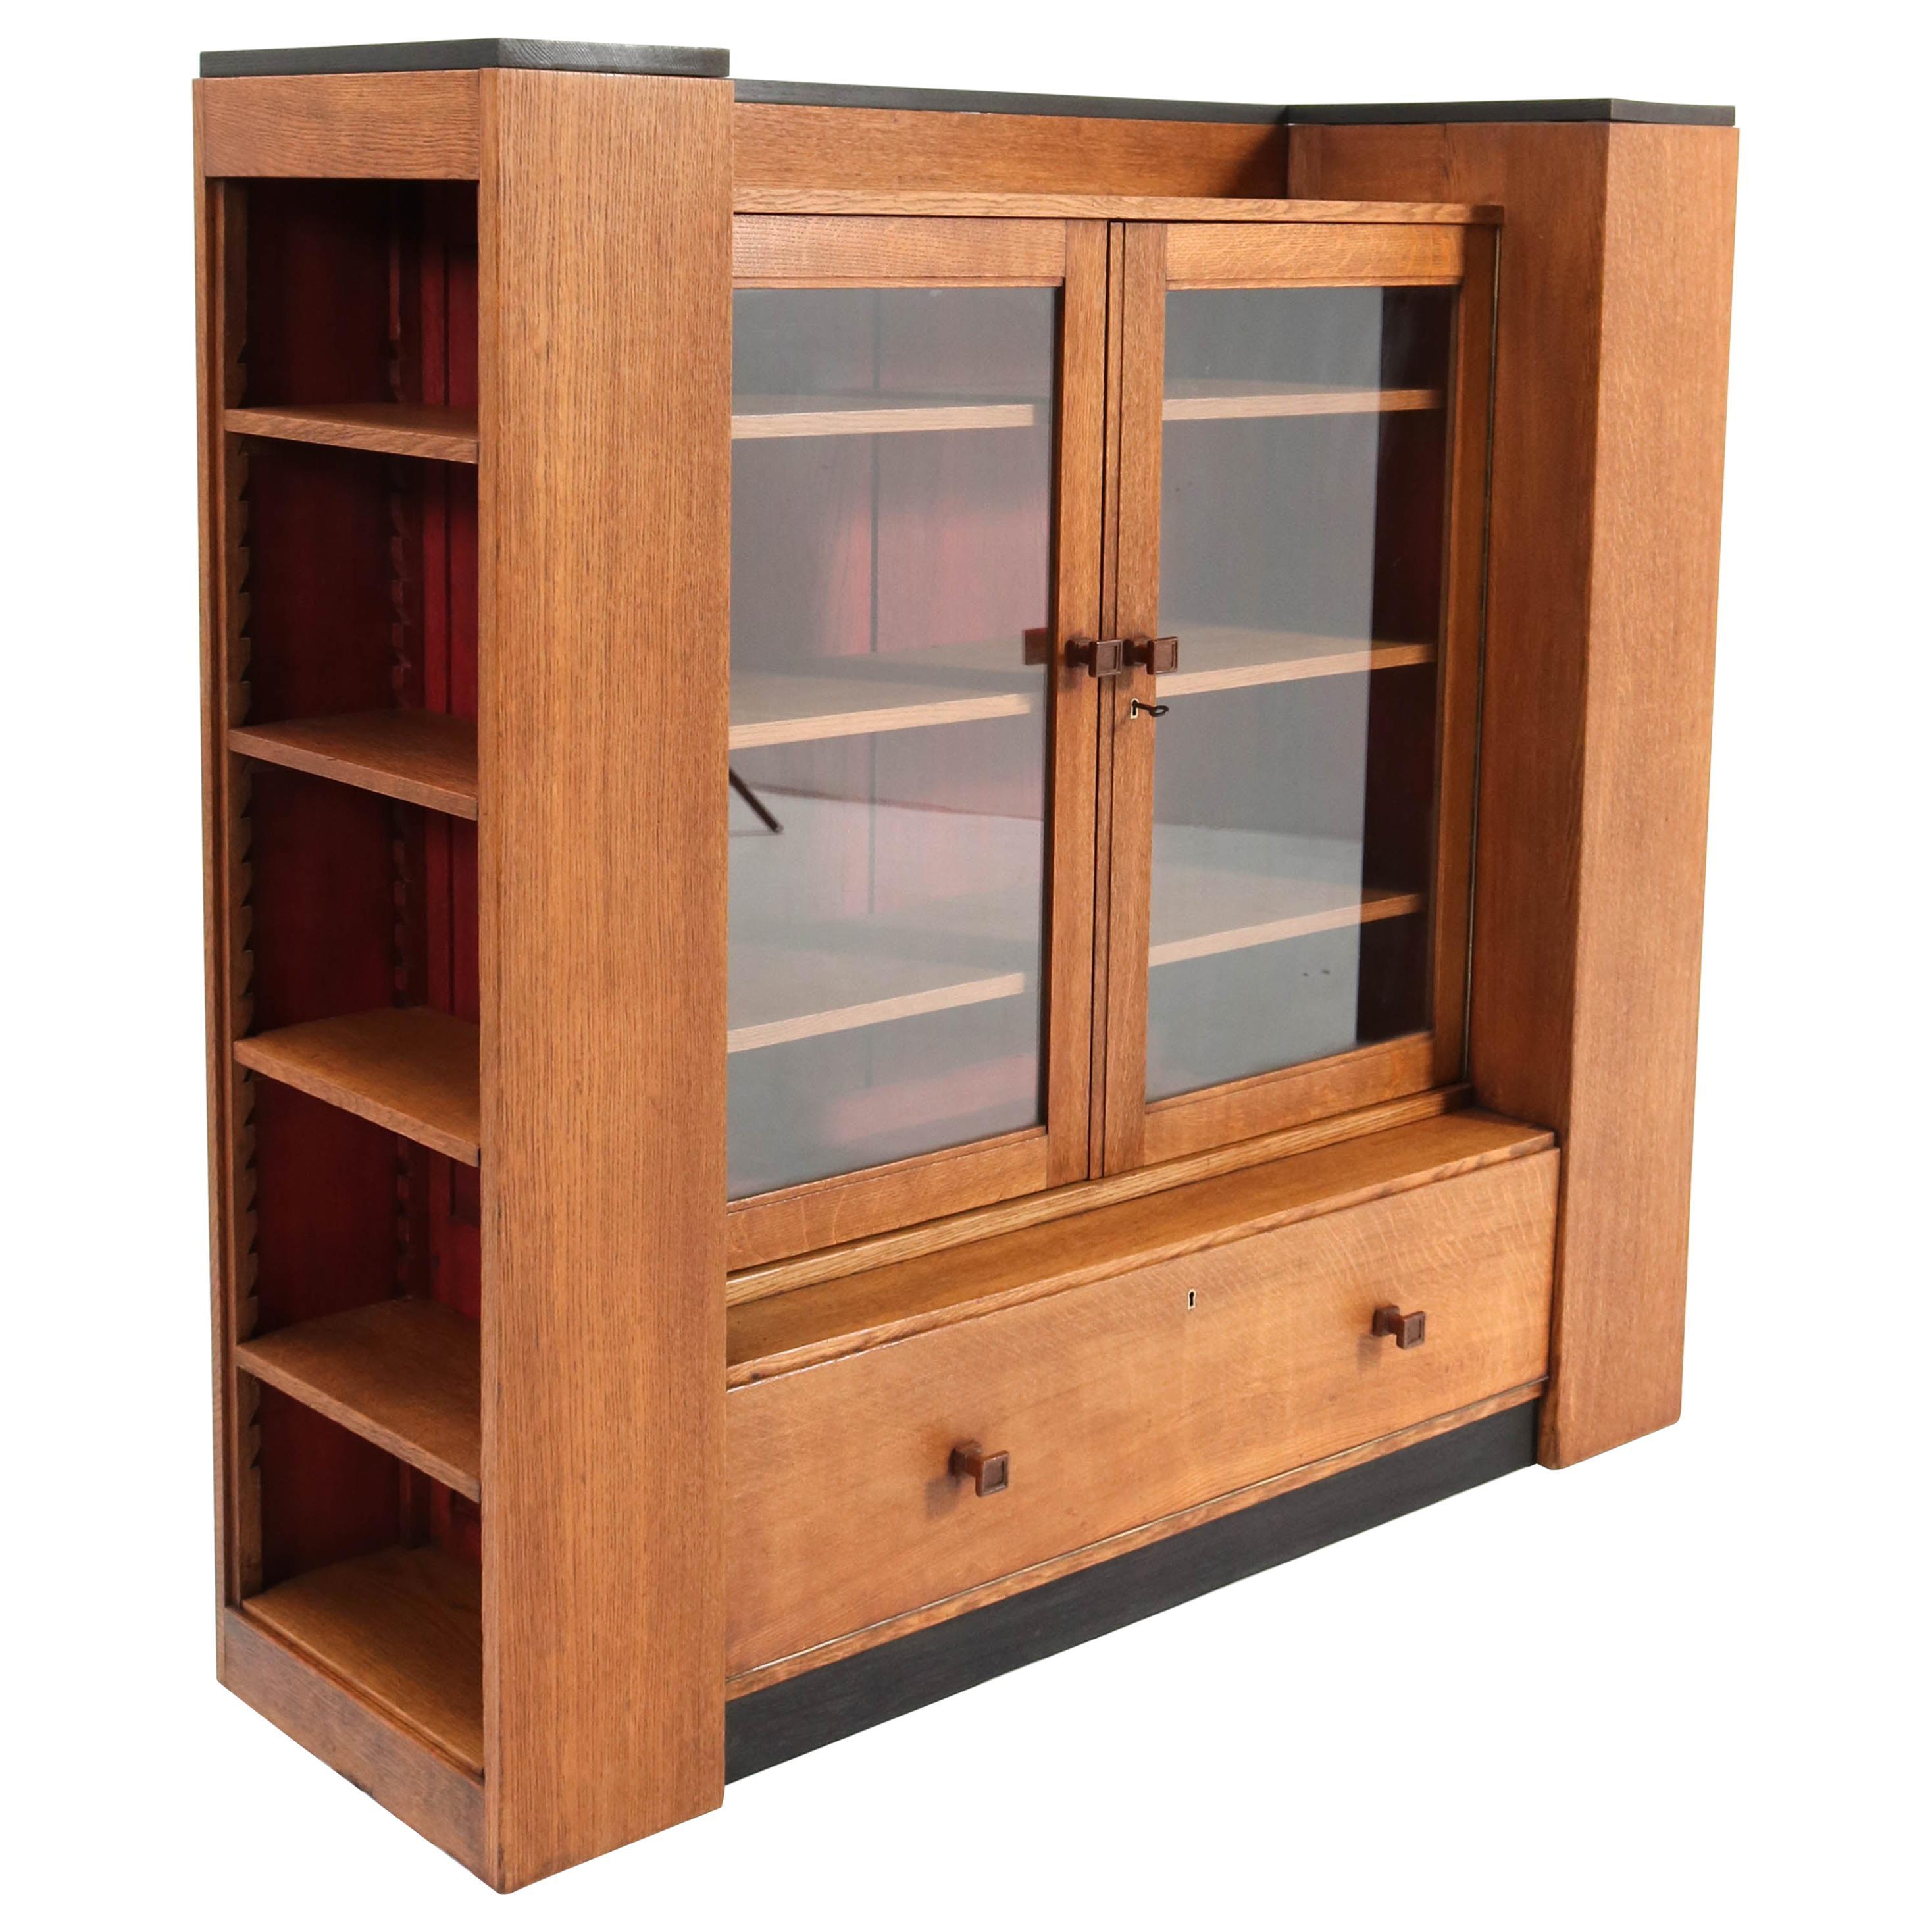 Oak Art Deco Haagse School Bookcase by Hendrik Wouda for Metz & Co. Amsterdam